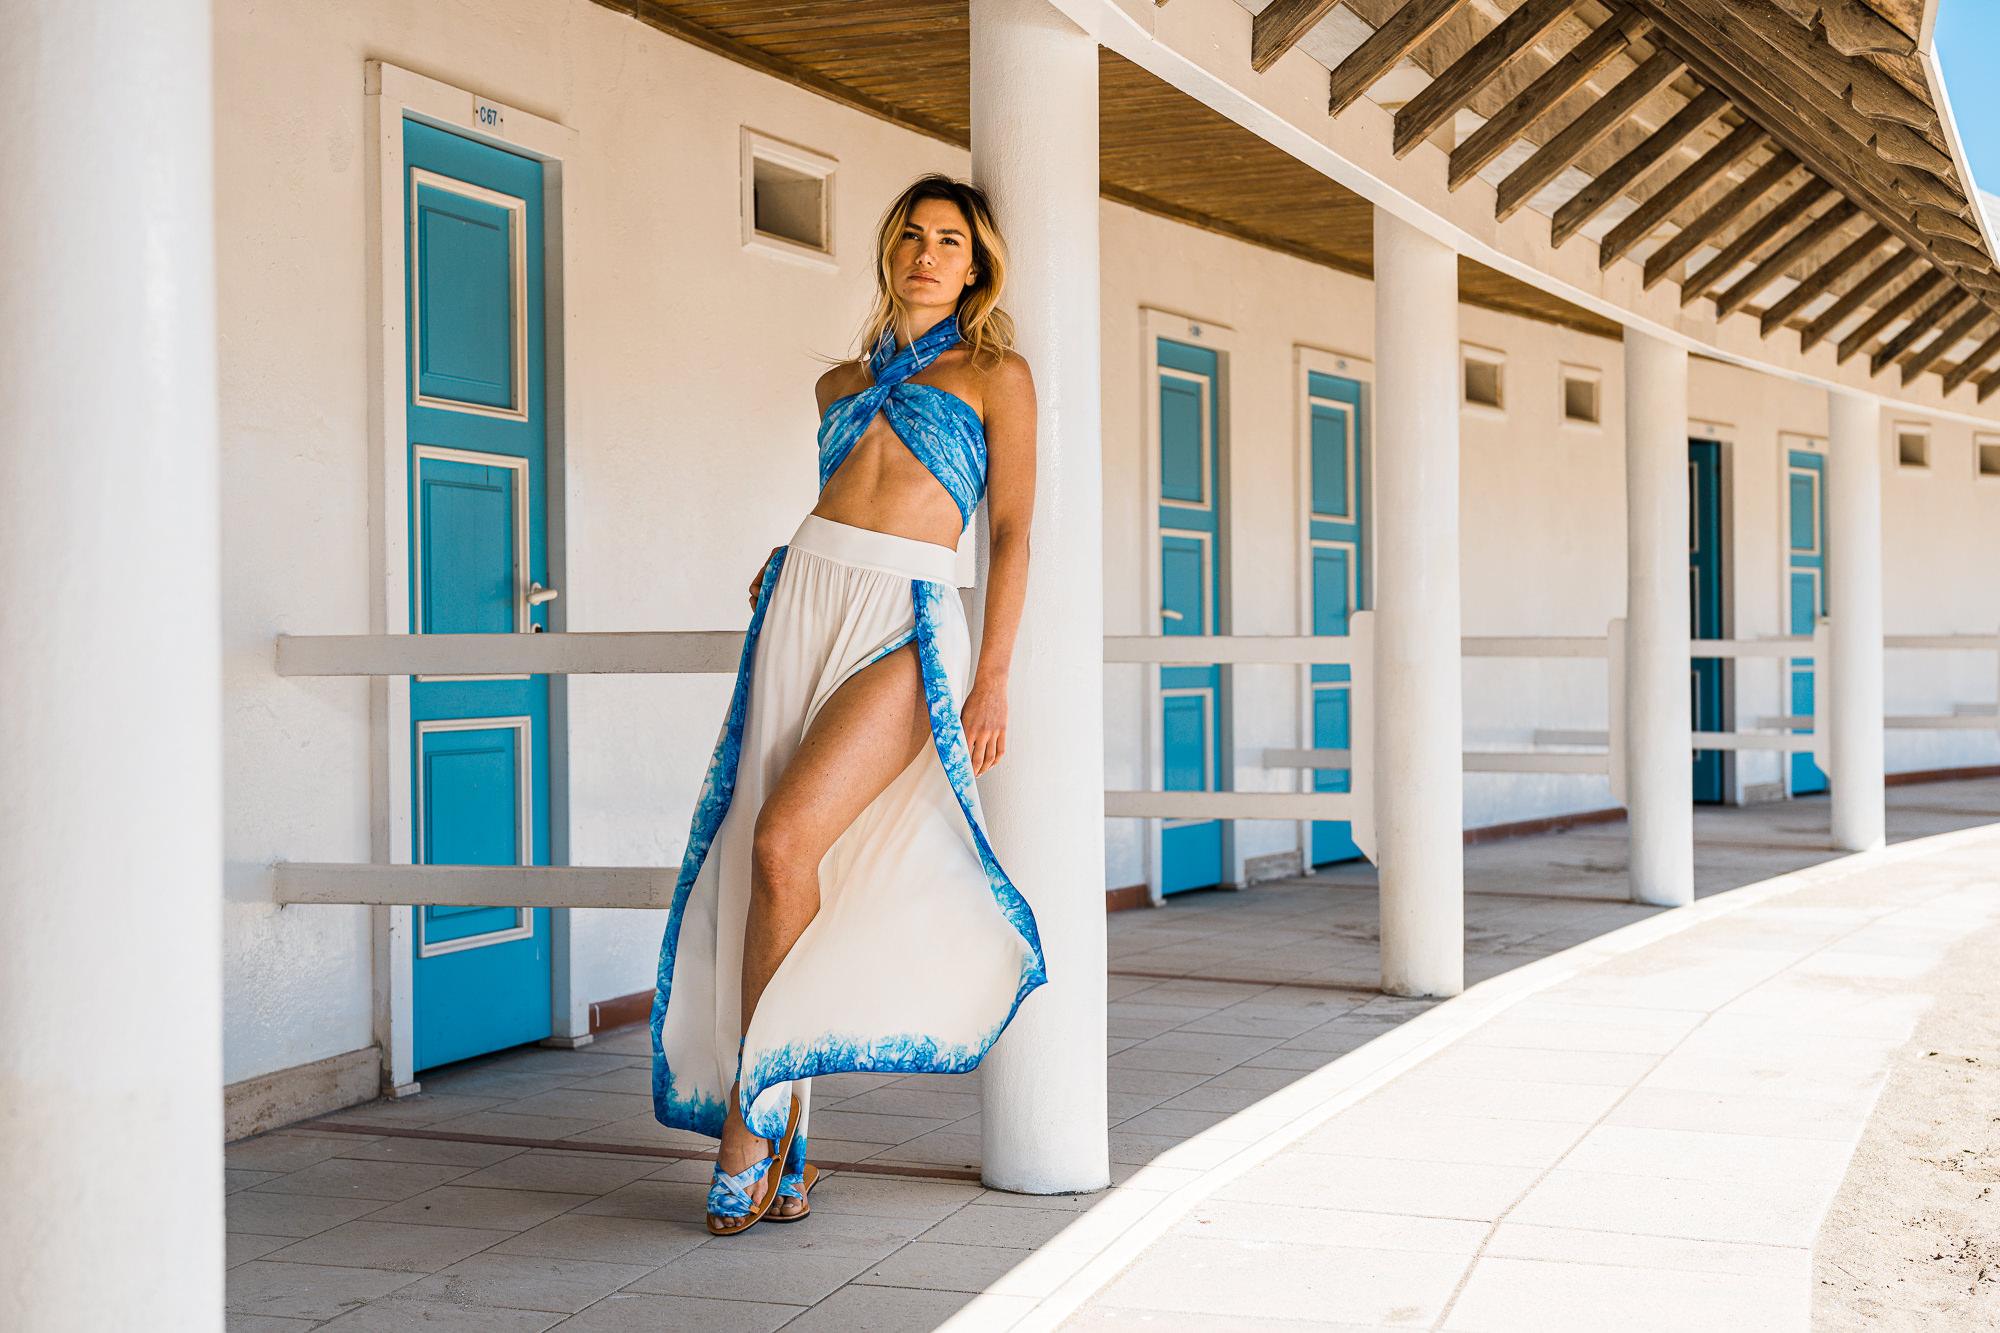 Roberta Baiardi - gonna pantalone